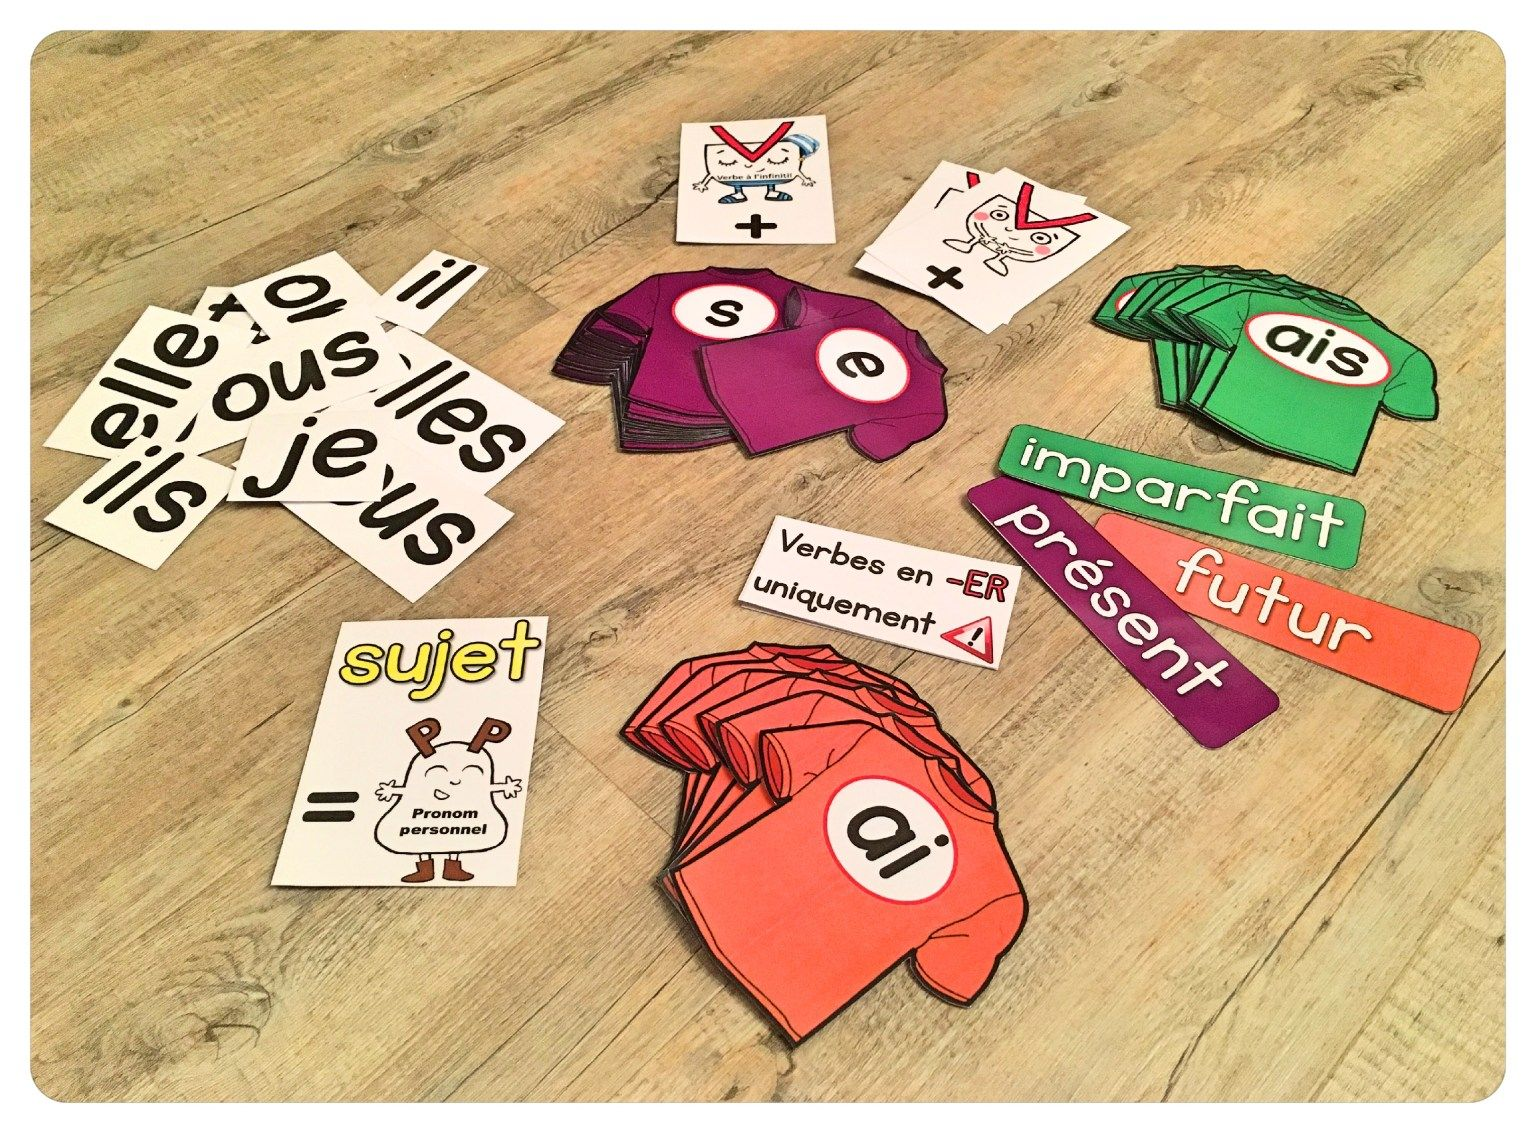 Garde Robe Du Verbe Affichage Evolutif Conjugaison Verbe Jeux Ecole Jeu Conjugaison